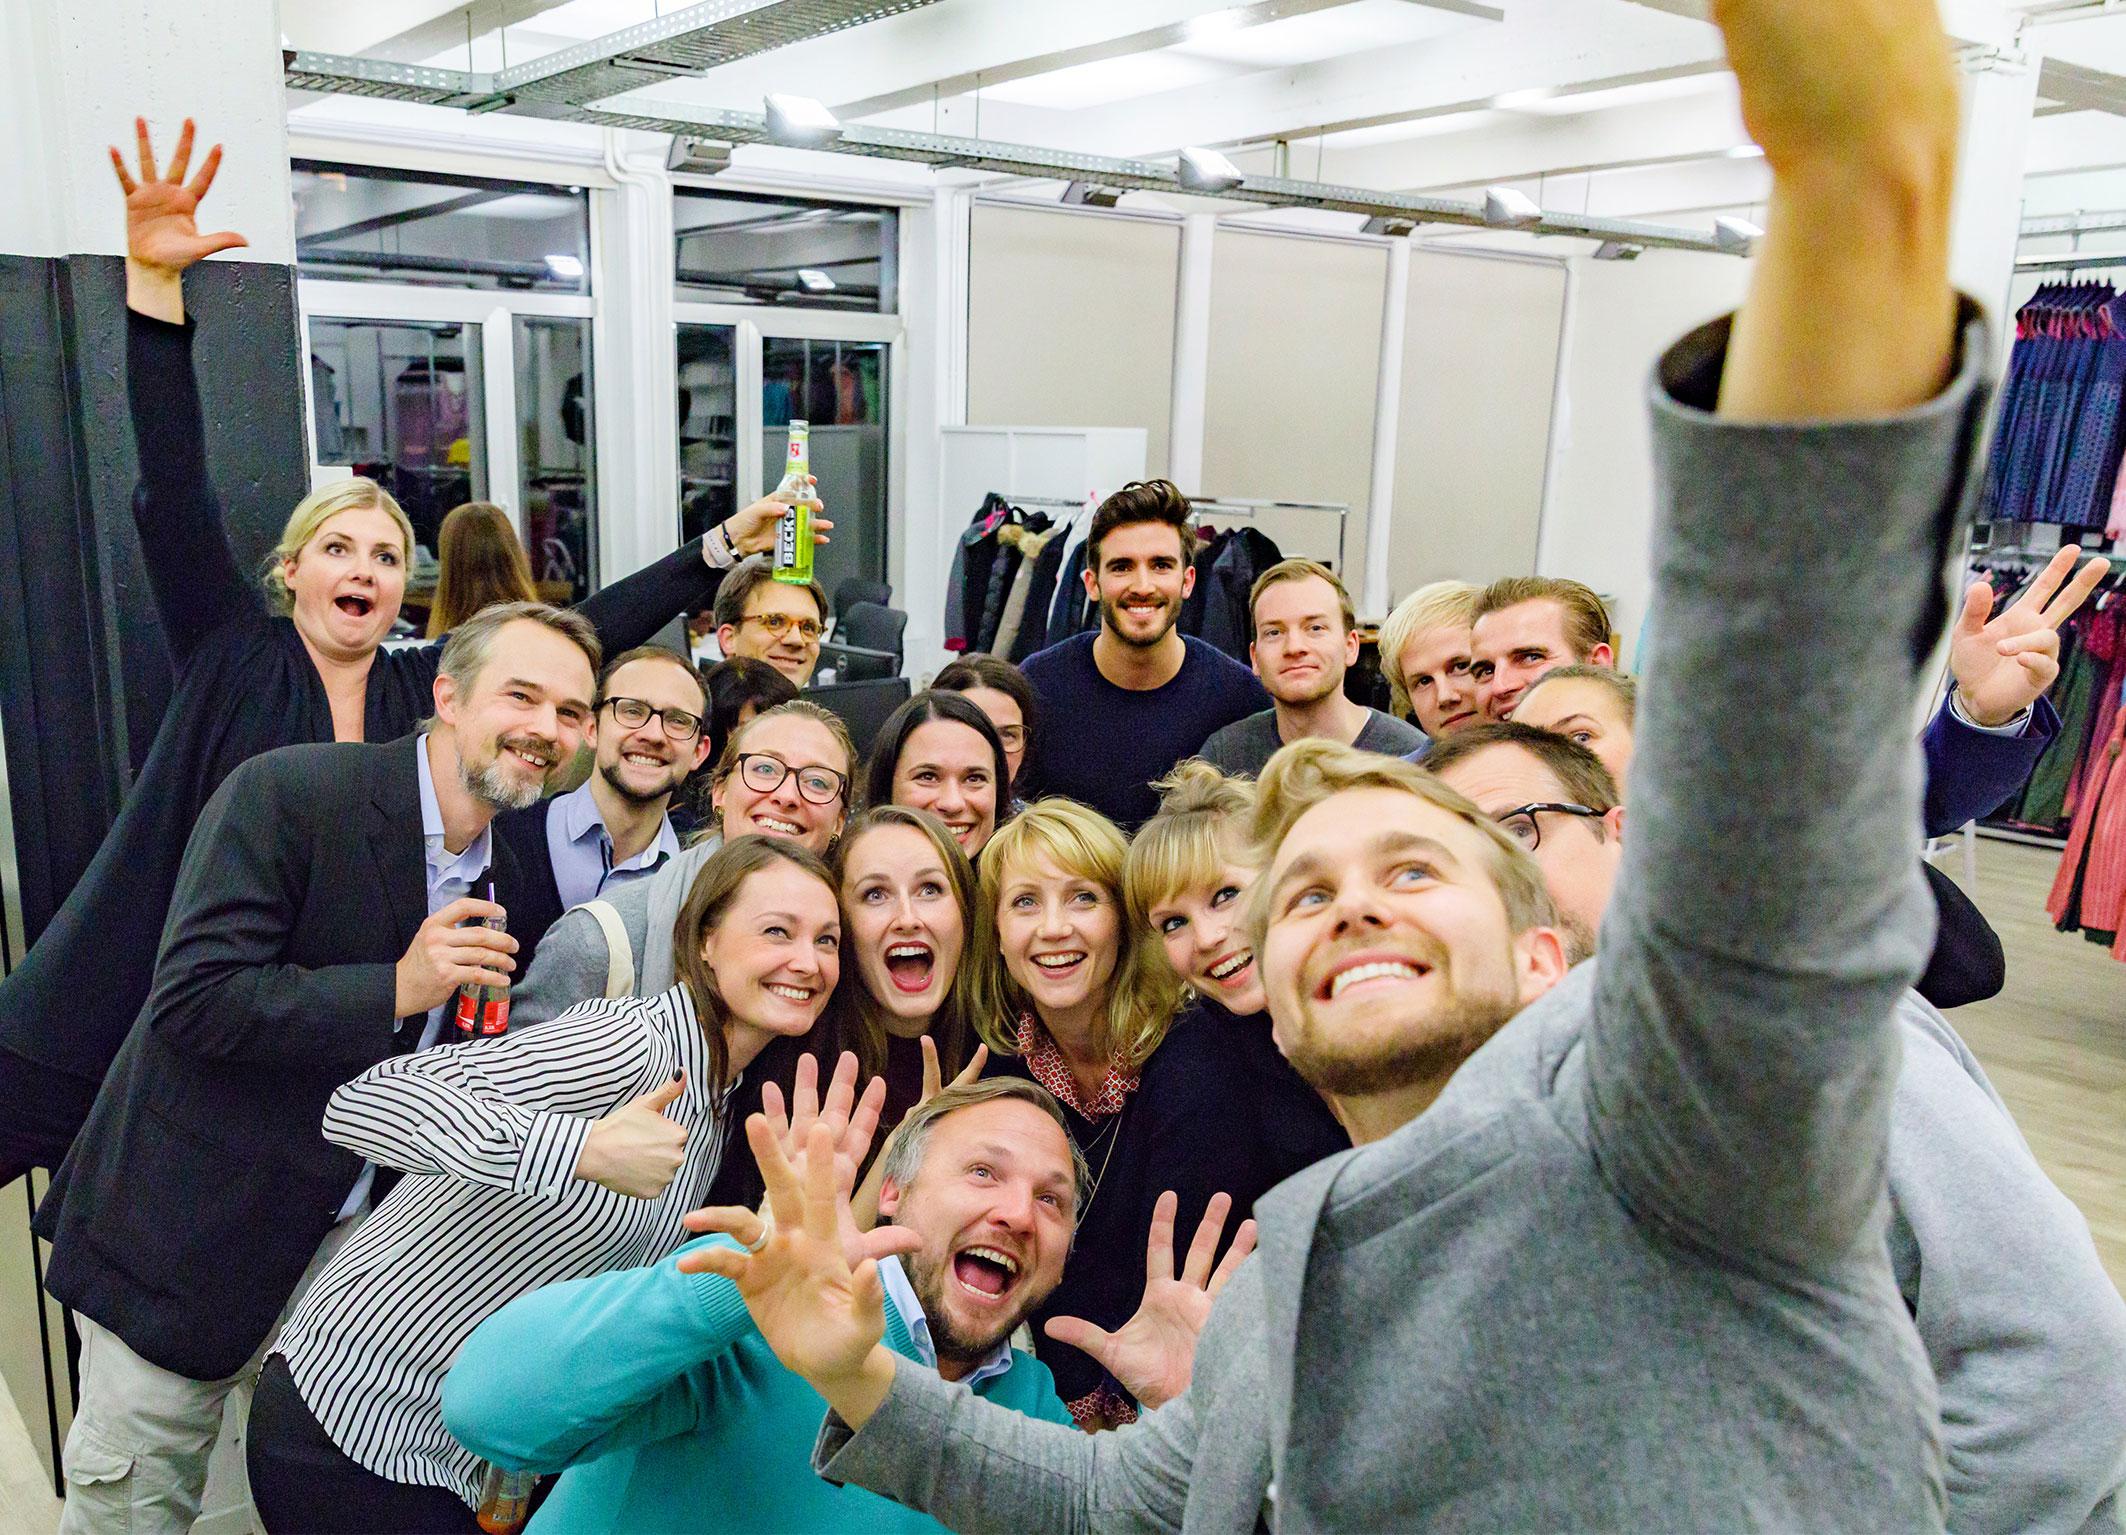 hoehle-der-loewen-startups-hamburg-selfie